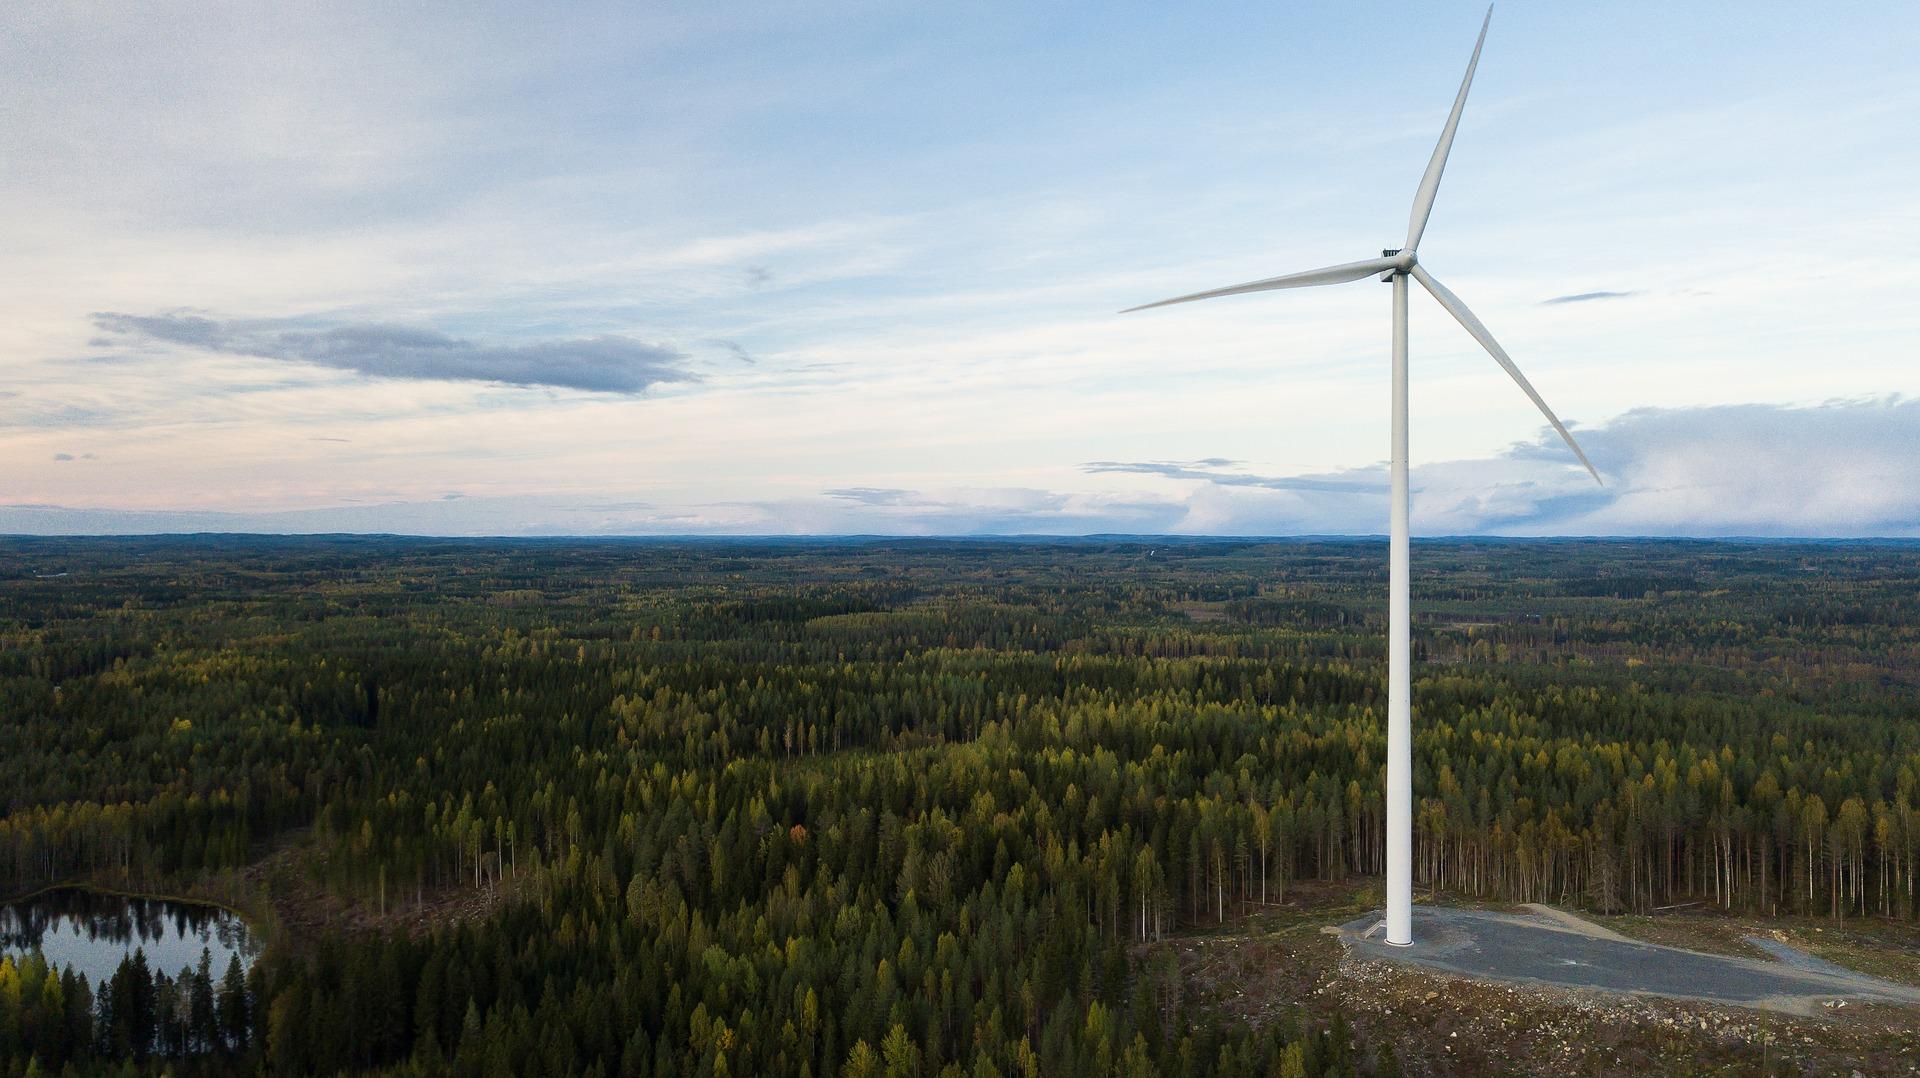 Worldcom Confidence Index: Energia-alan luottamus tulevaan kohentunut